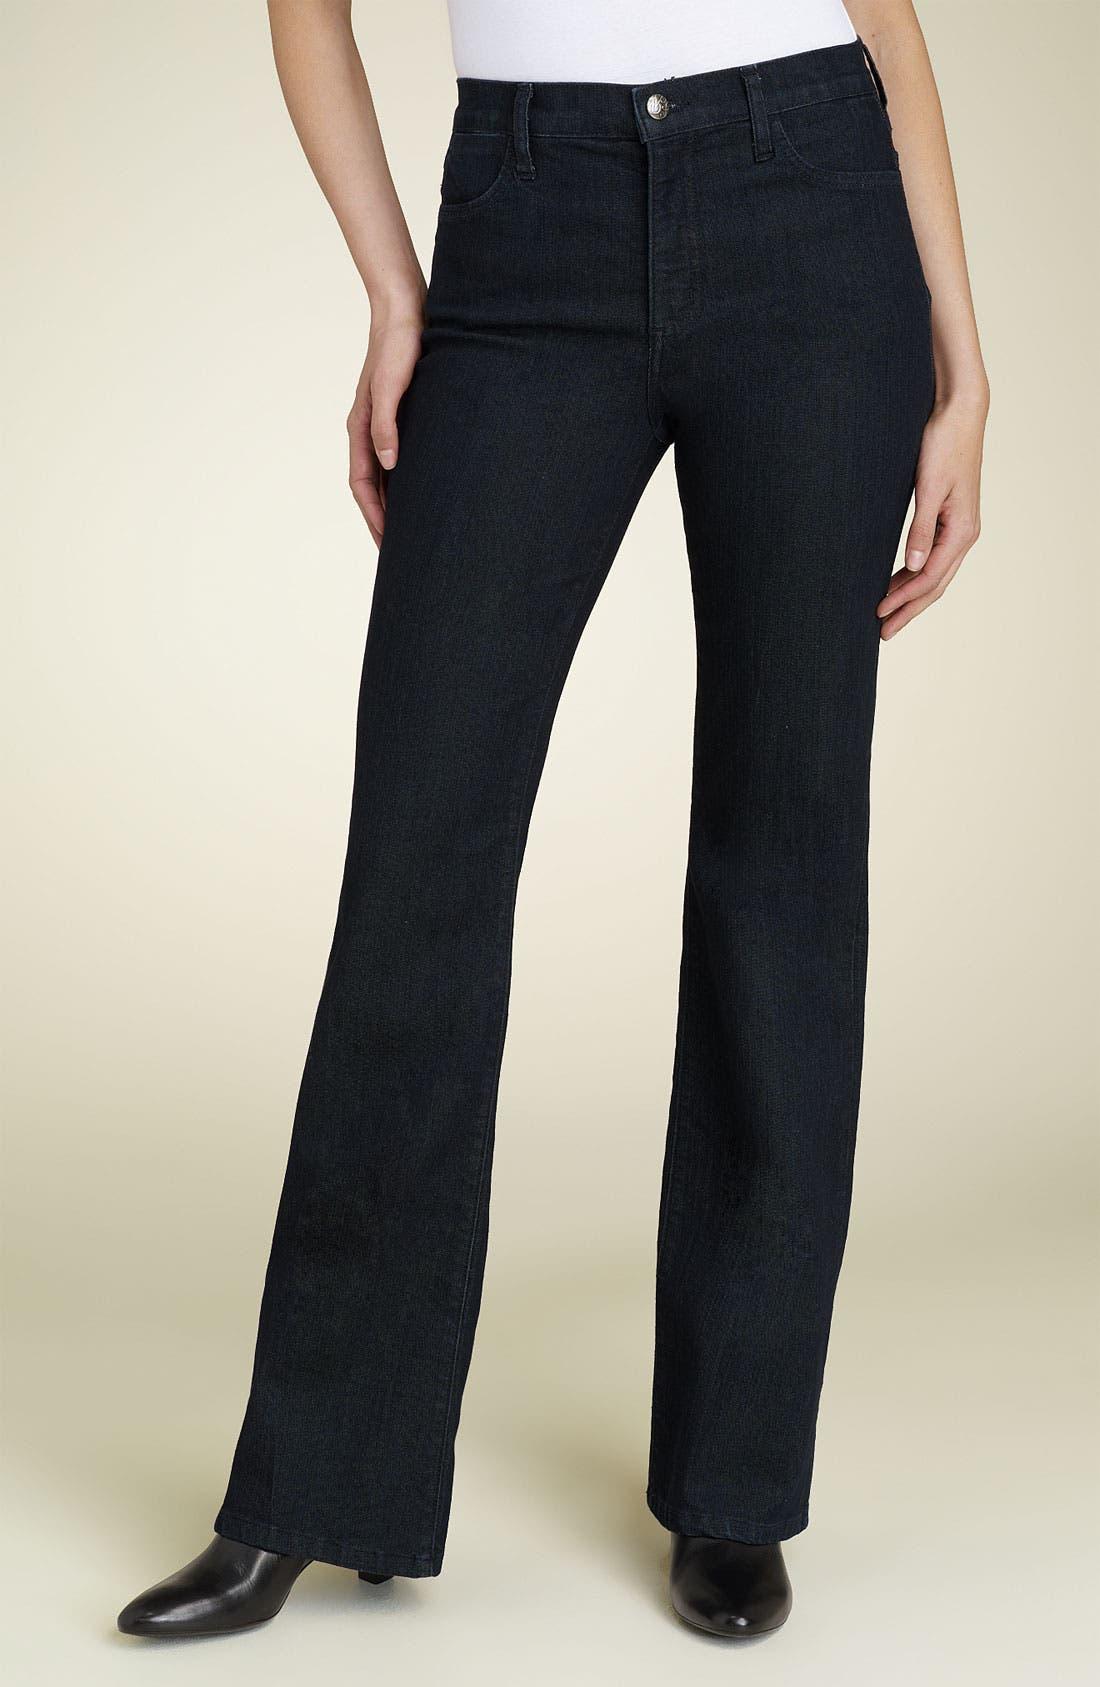 Main Image - NYDJ 'Basic' Bootcut Stretch Jeans (Long)